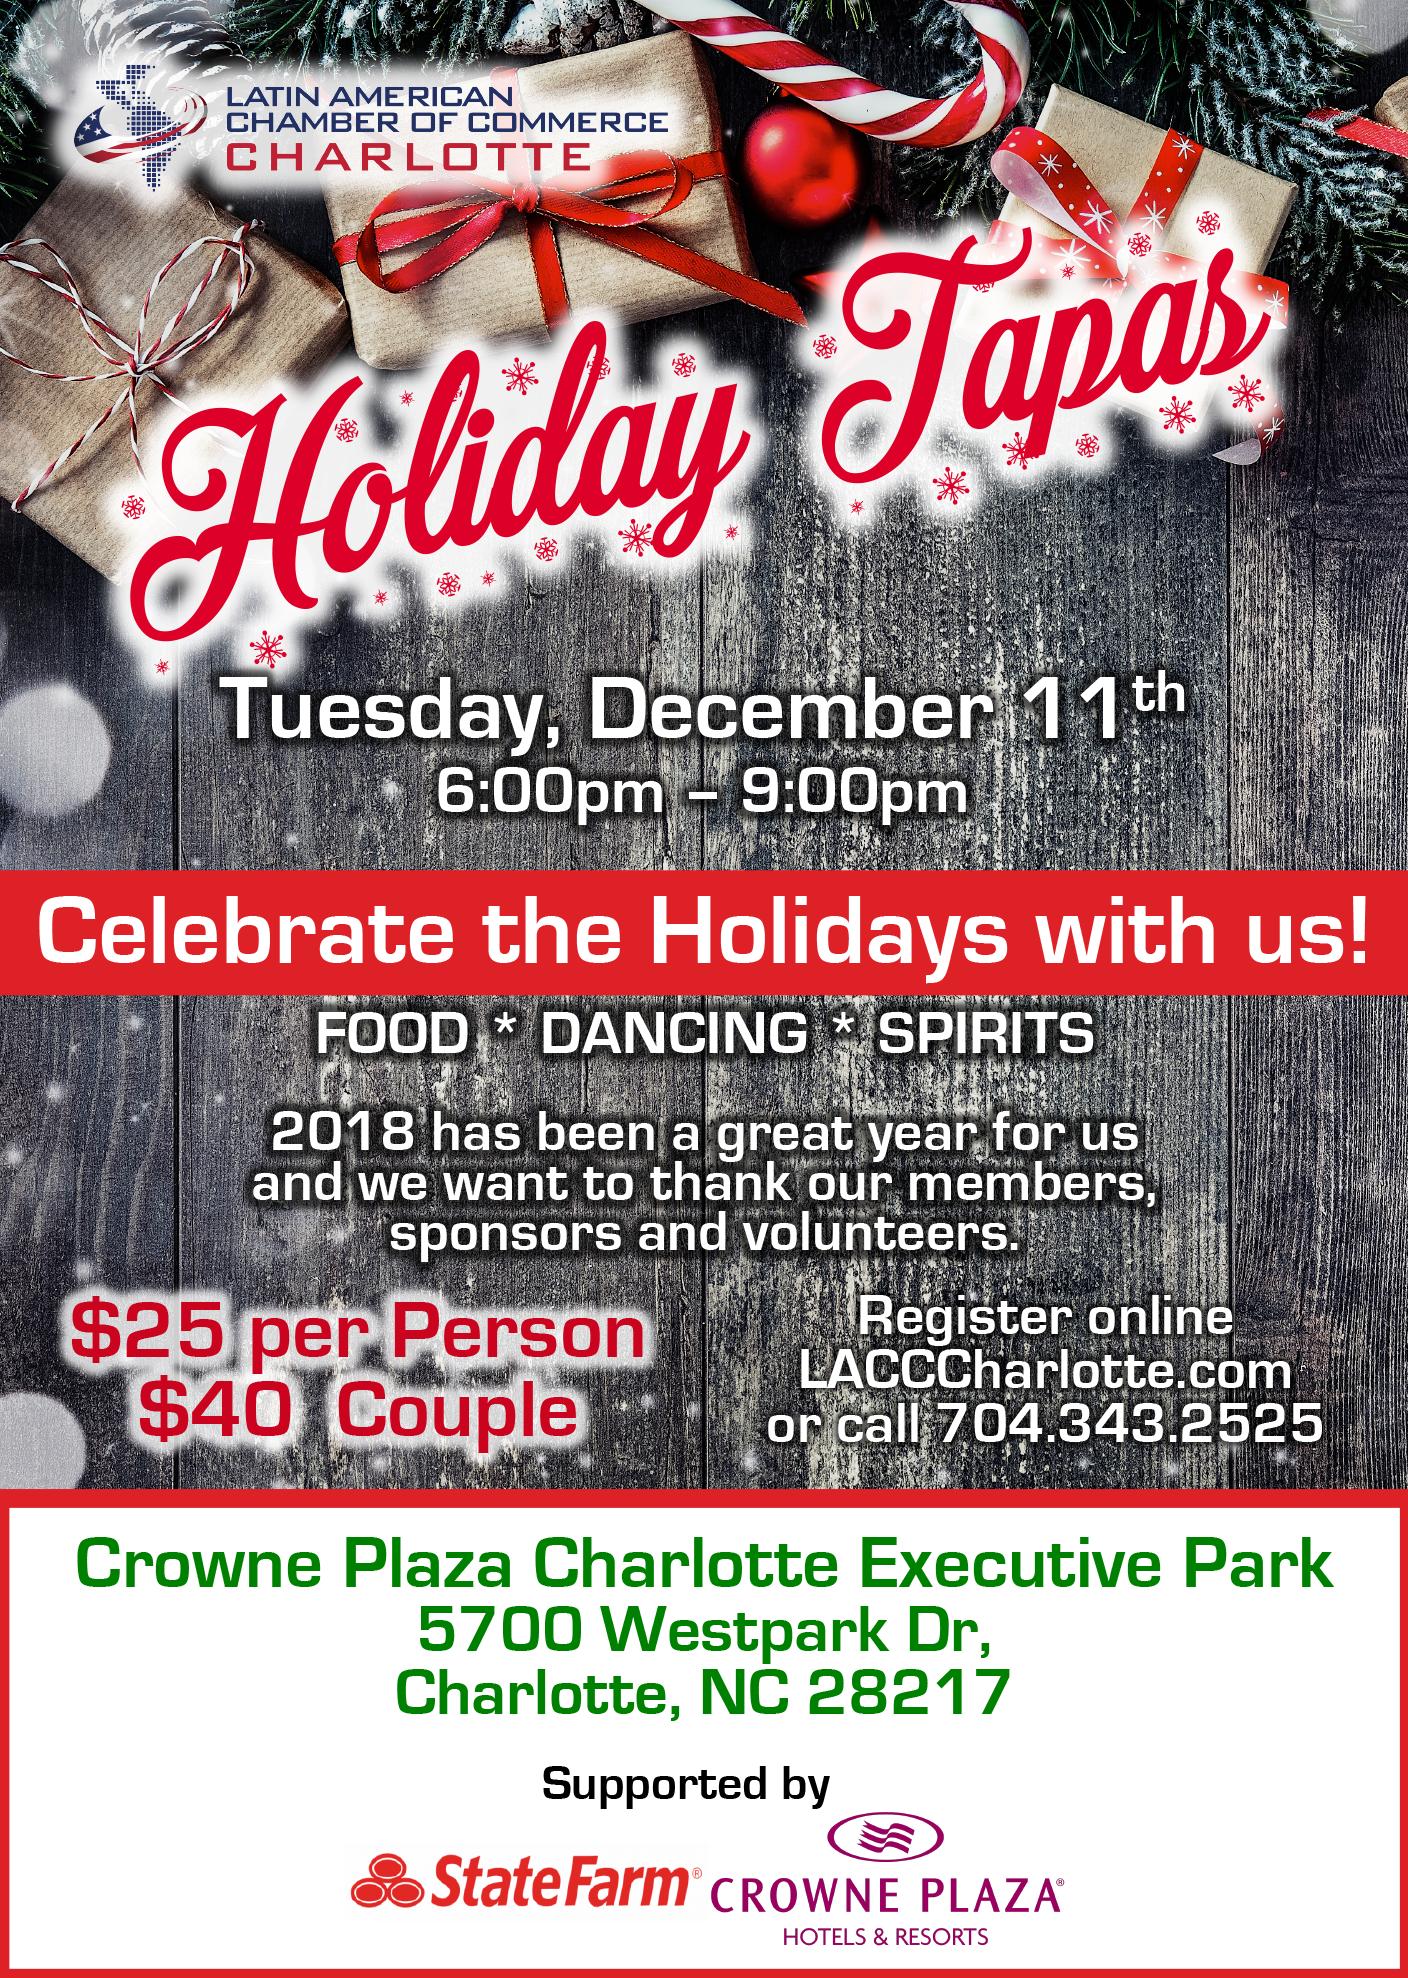 Latin American Chamber of Commerce - Holiday Tapas 2018 at Crowne Plaza Charlotte Executive Park @ Crowne Plaza Charlotte Executive Park   Charlotte   North Carolina   United States